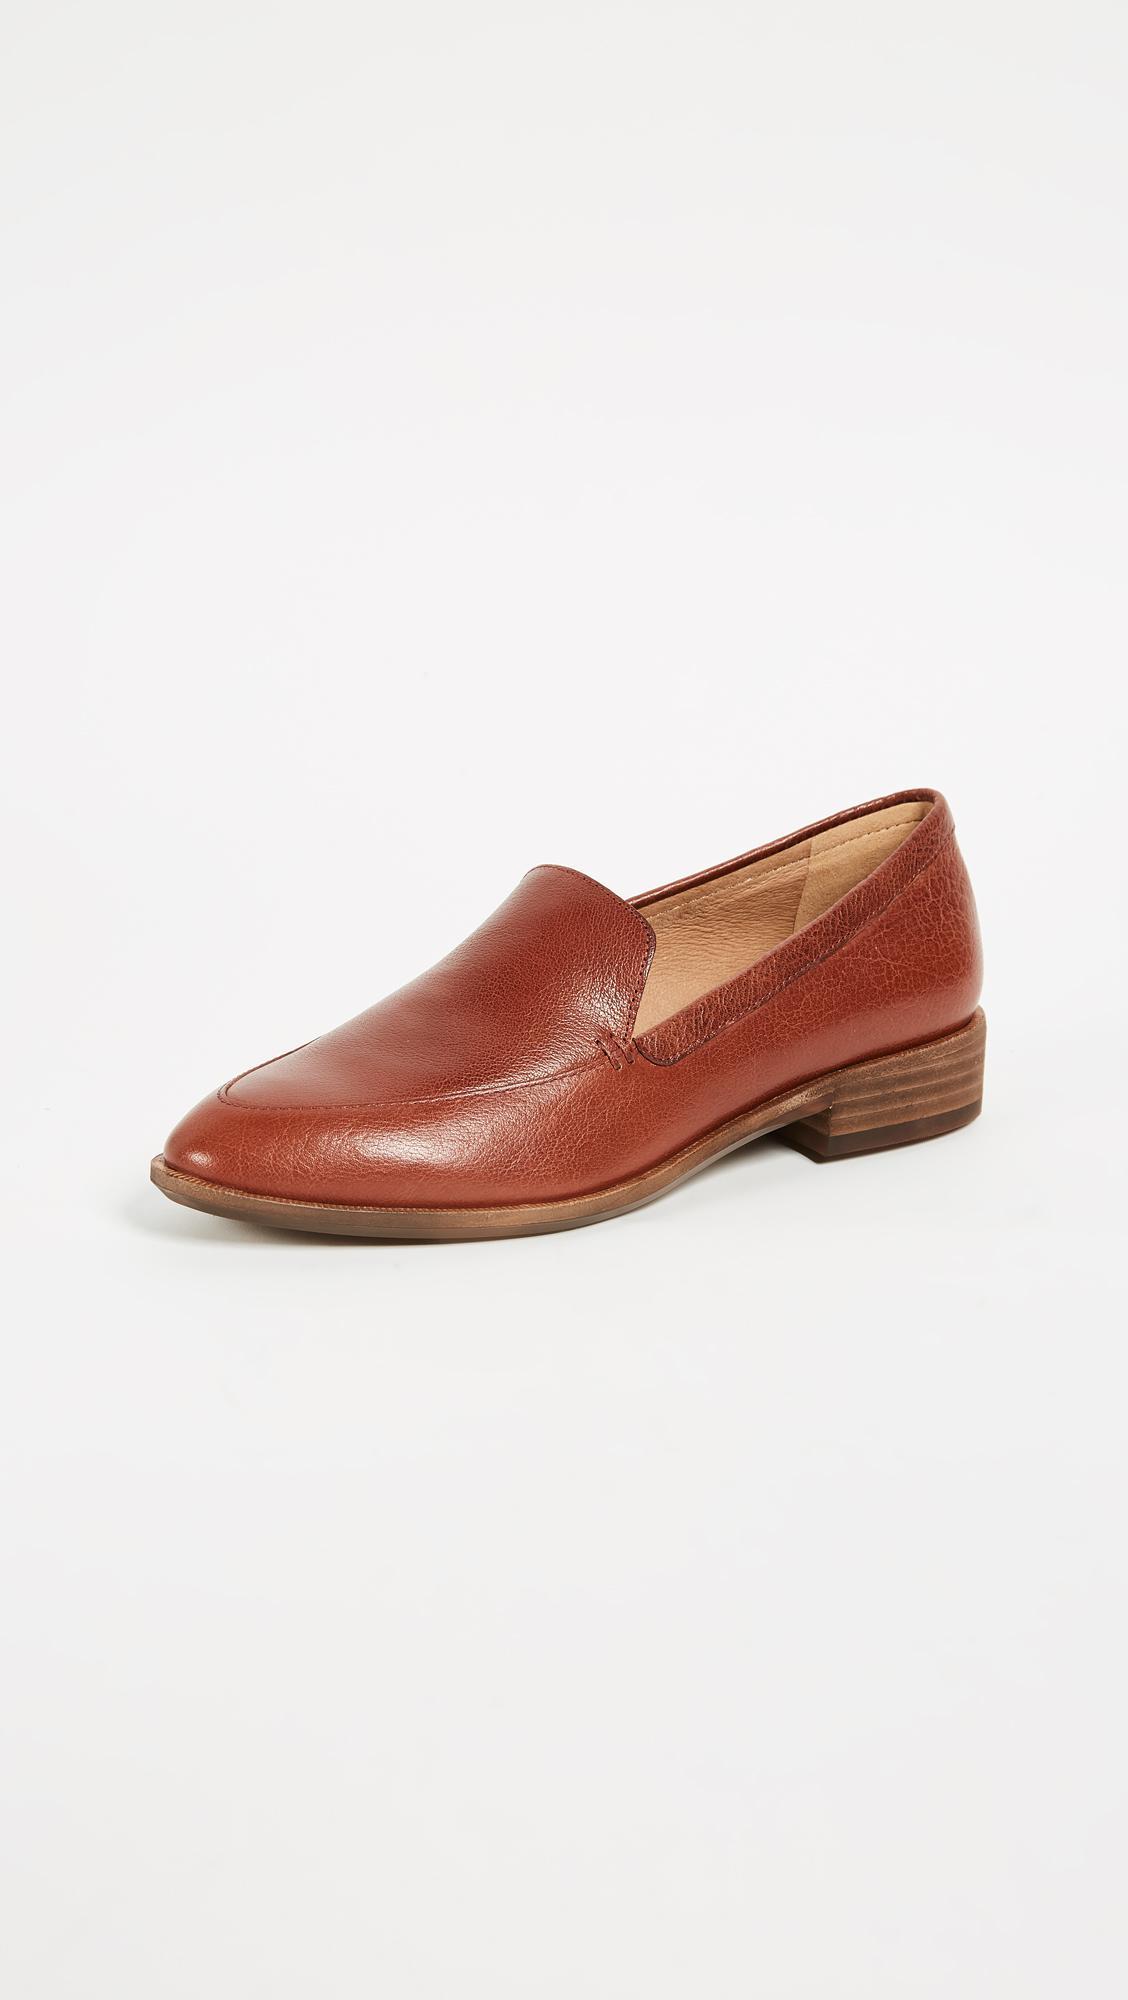 b84fb3cef5b Lyst - Madewell Perin Loafers